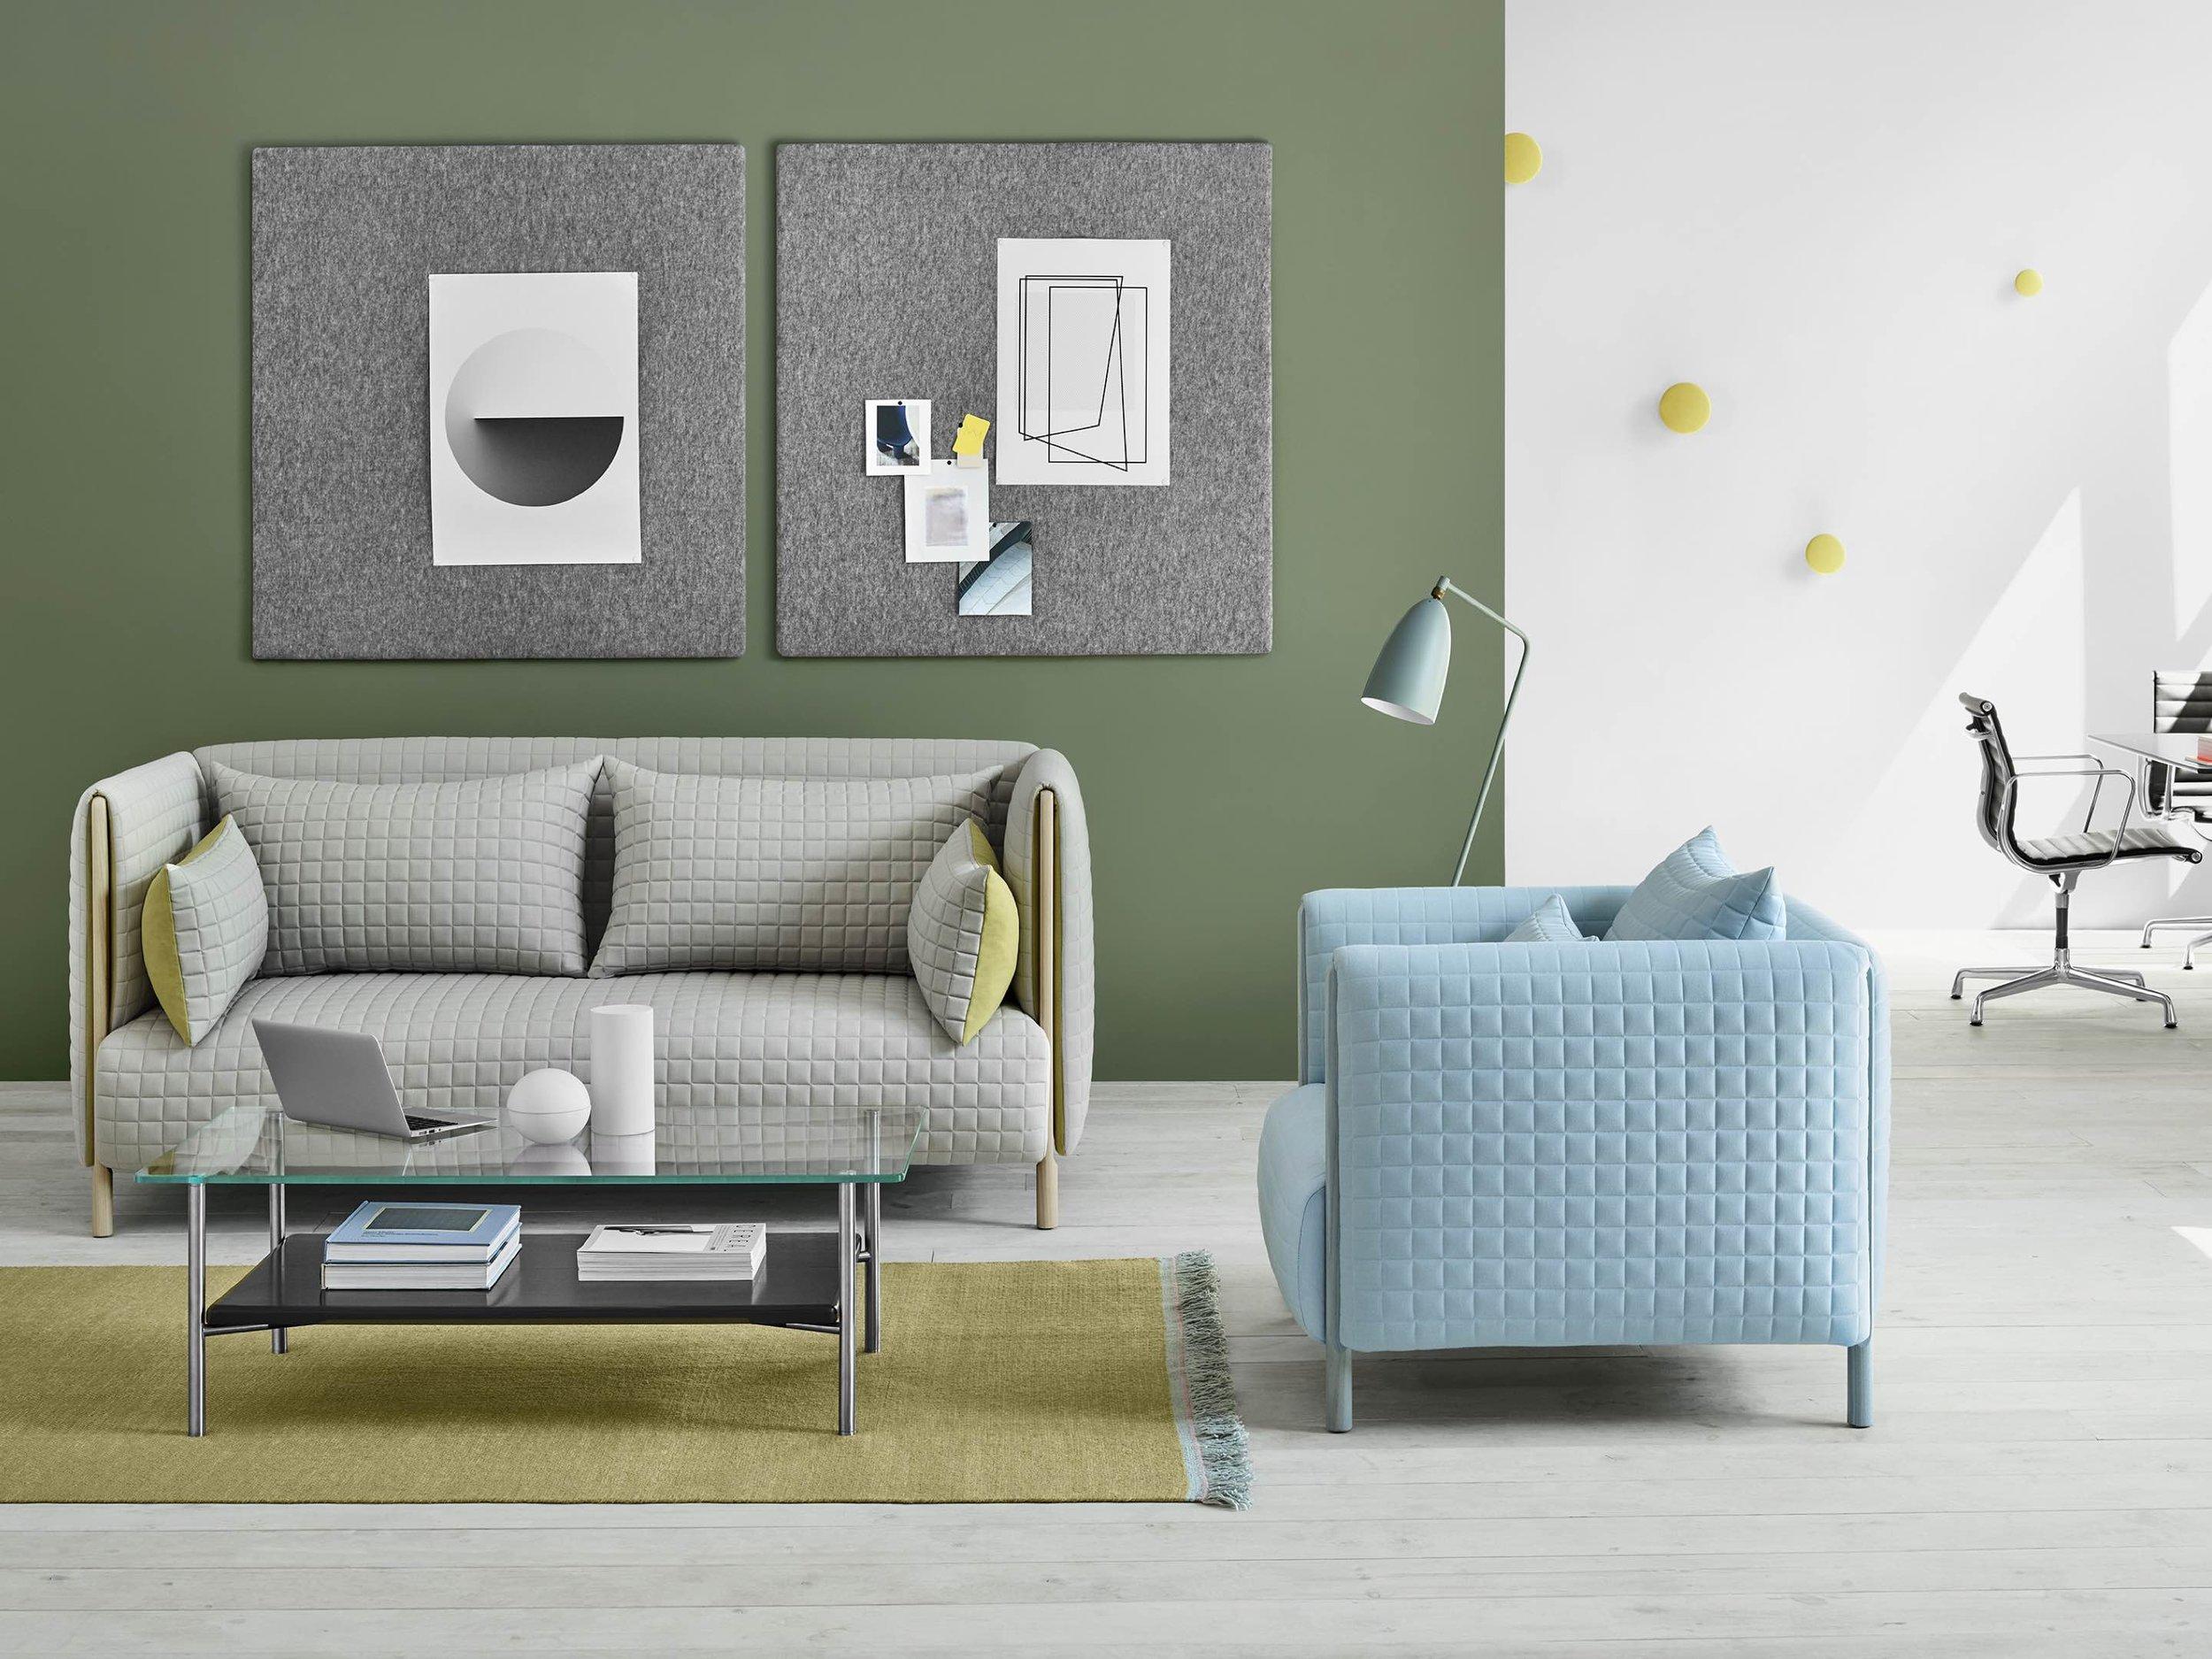 ig_prd_ovw_colourform_sofa_group_03.jpg